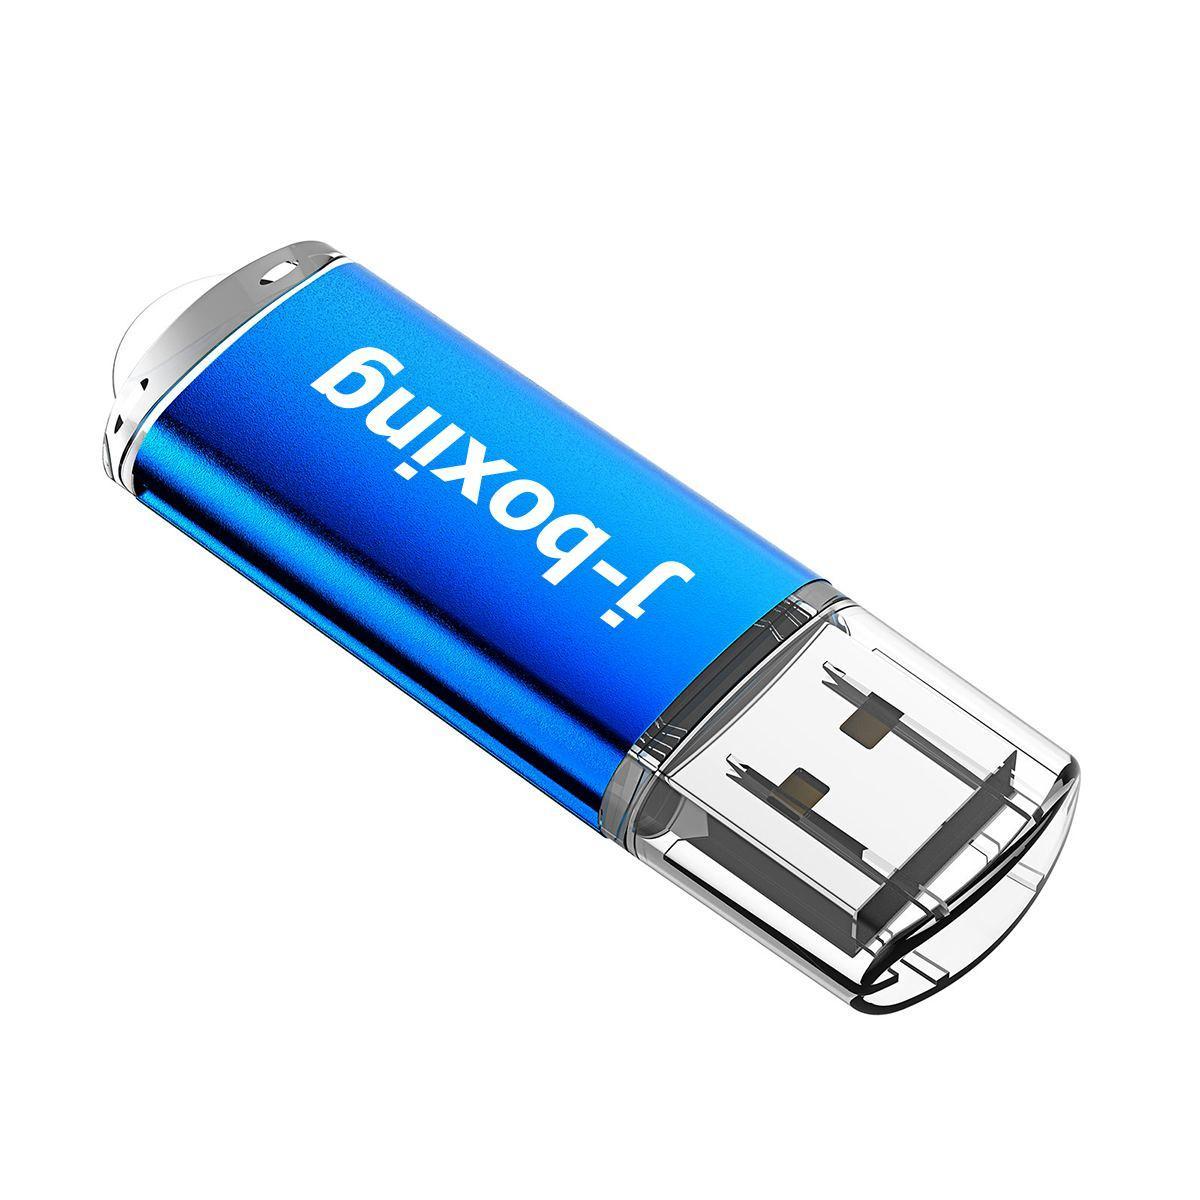 10 Pack Rectangle 1GB USB 2.0 Flash Drive Thumb Drive Storage Flash Memory Stick